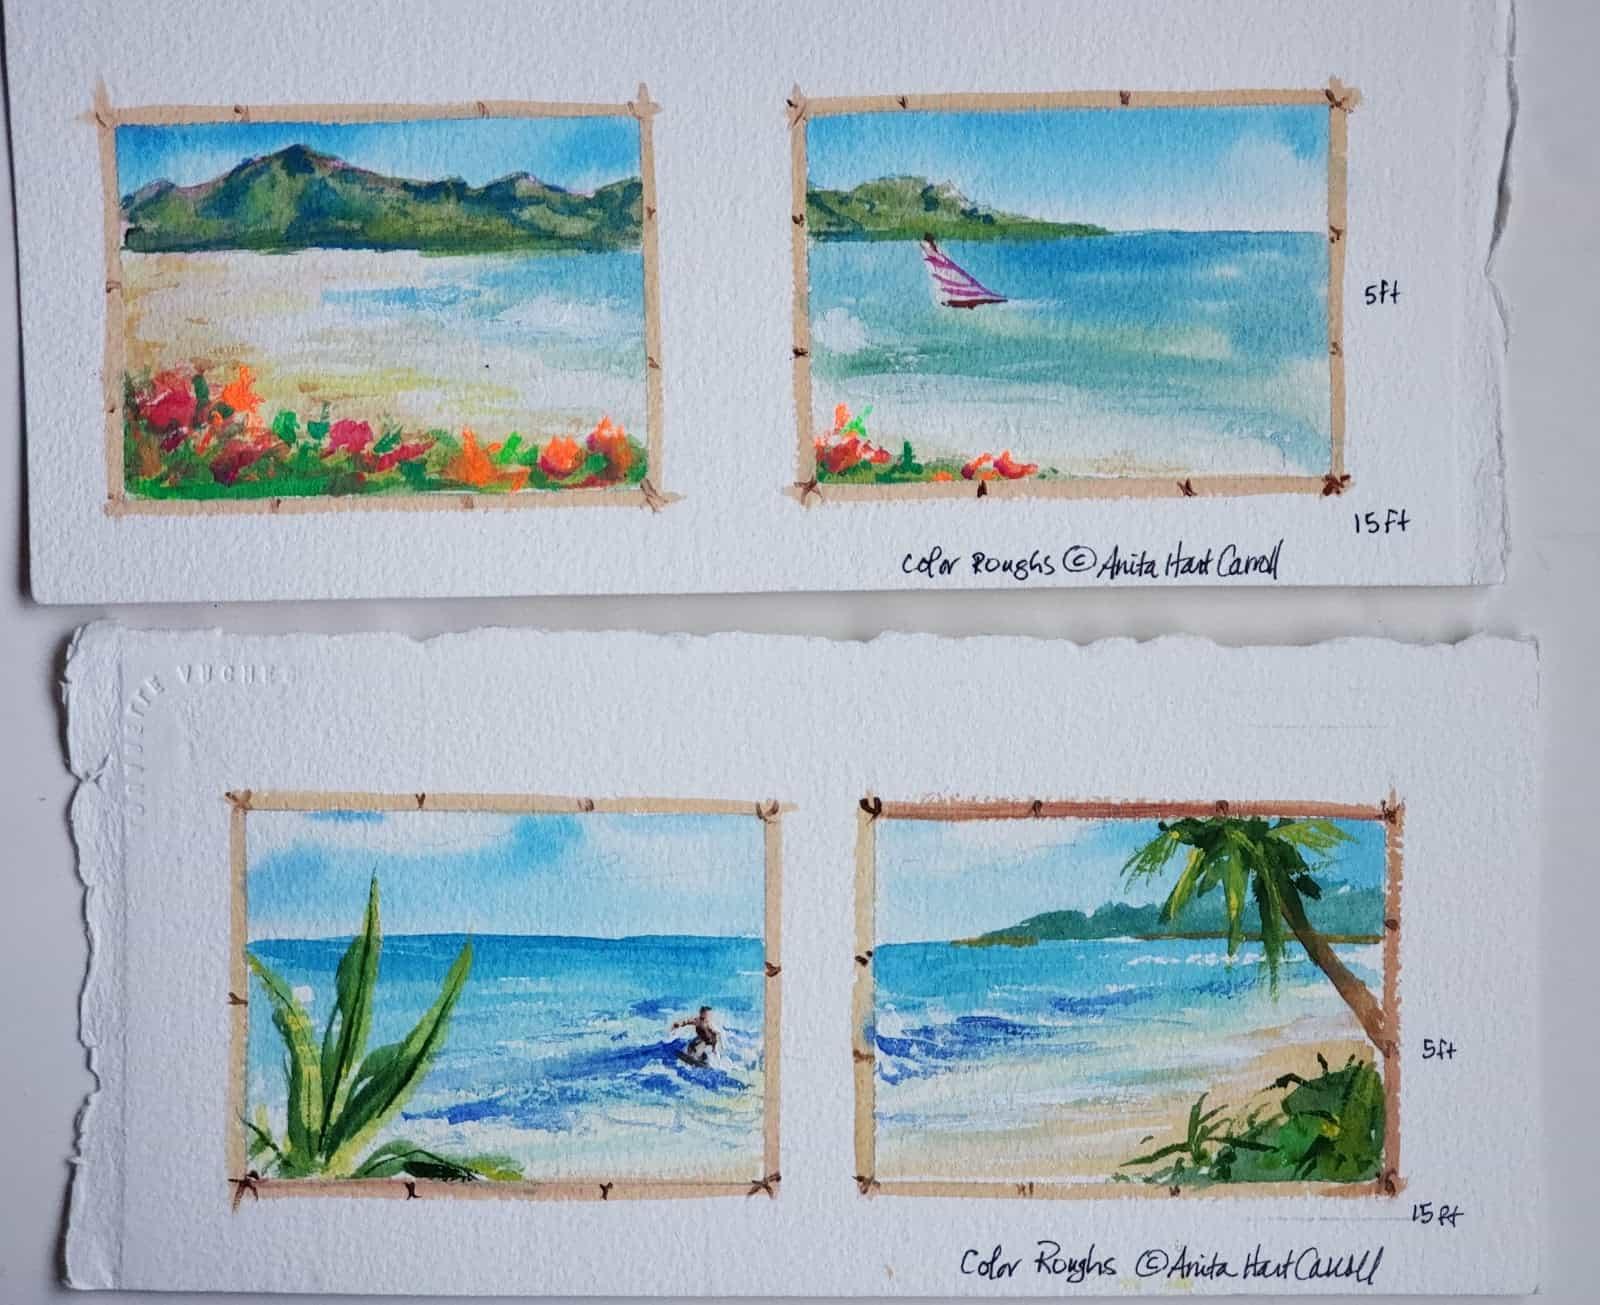 Hot Press or Cold Press Watercolor - Image 5 arches 300lb color roughs